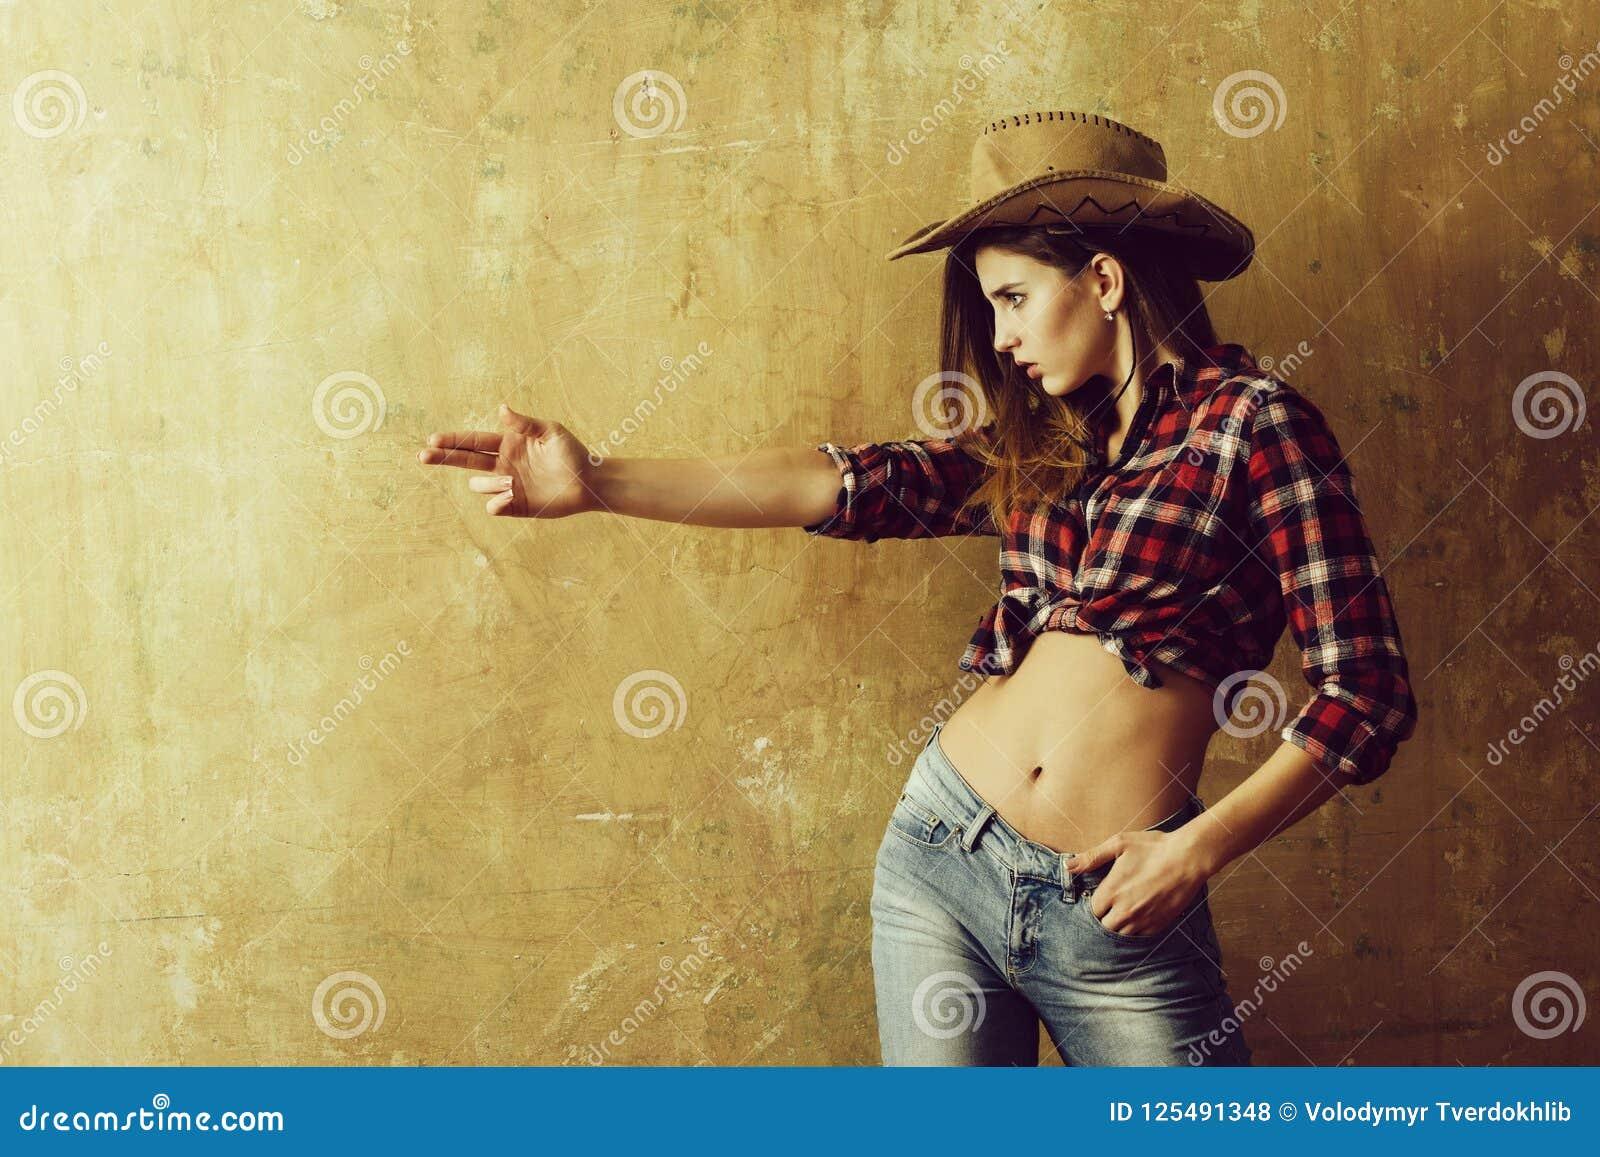 Pretty Girl In Stylish Cowboy Hat Showing Finger Gun Stock Photo ... 53f3621ae34